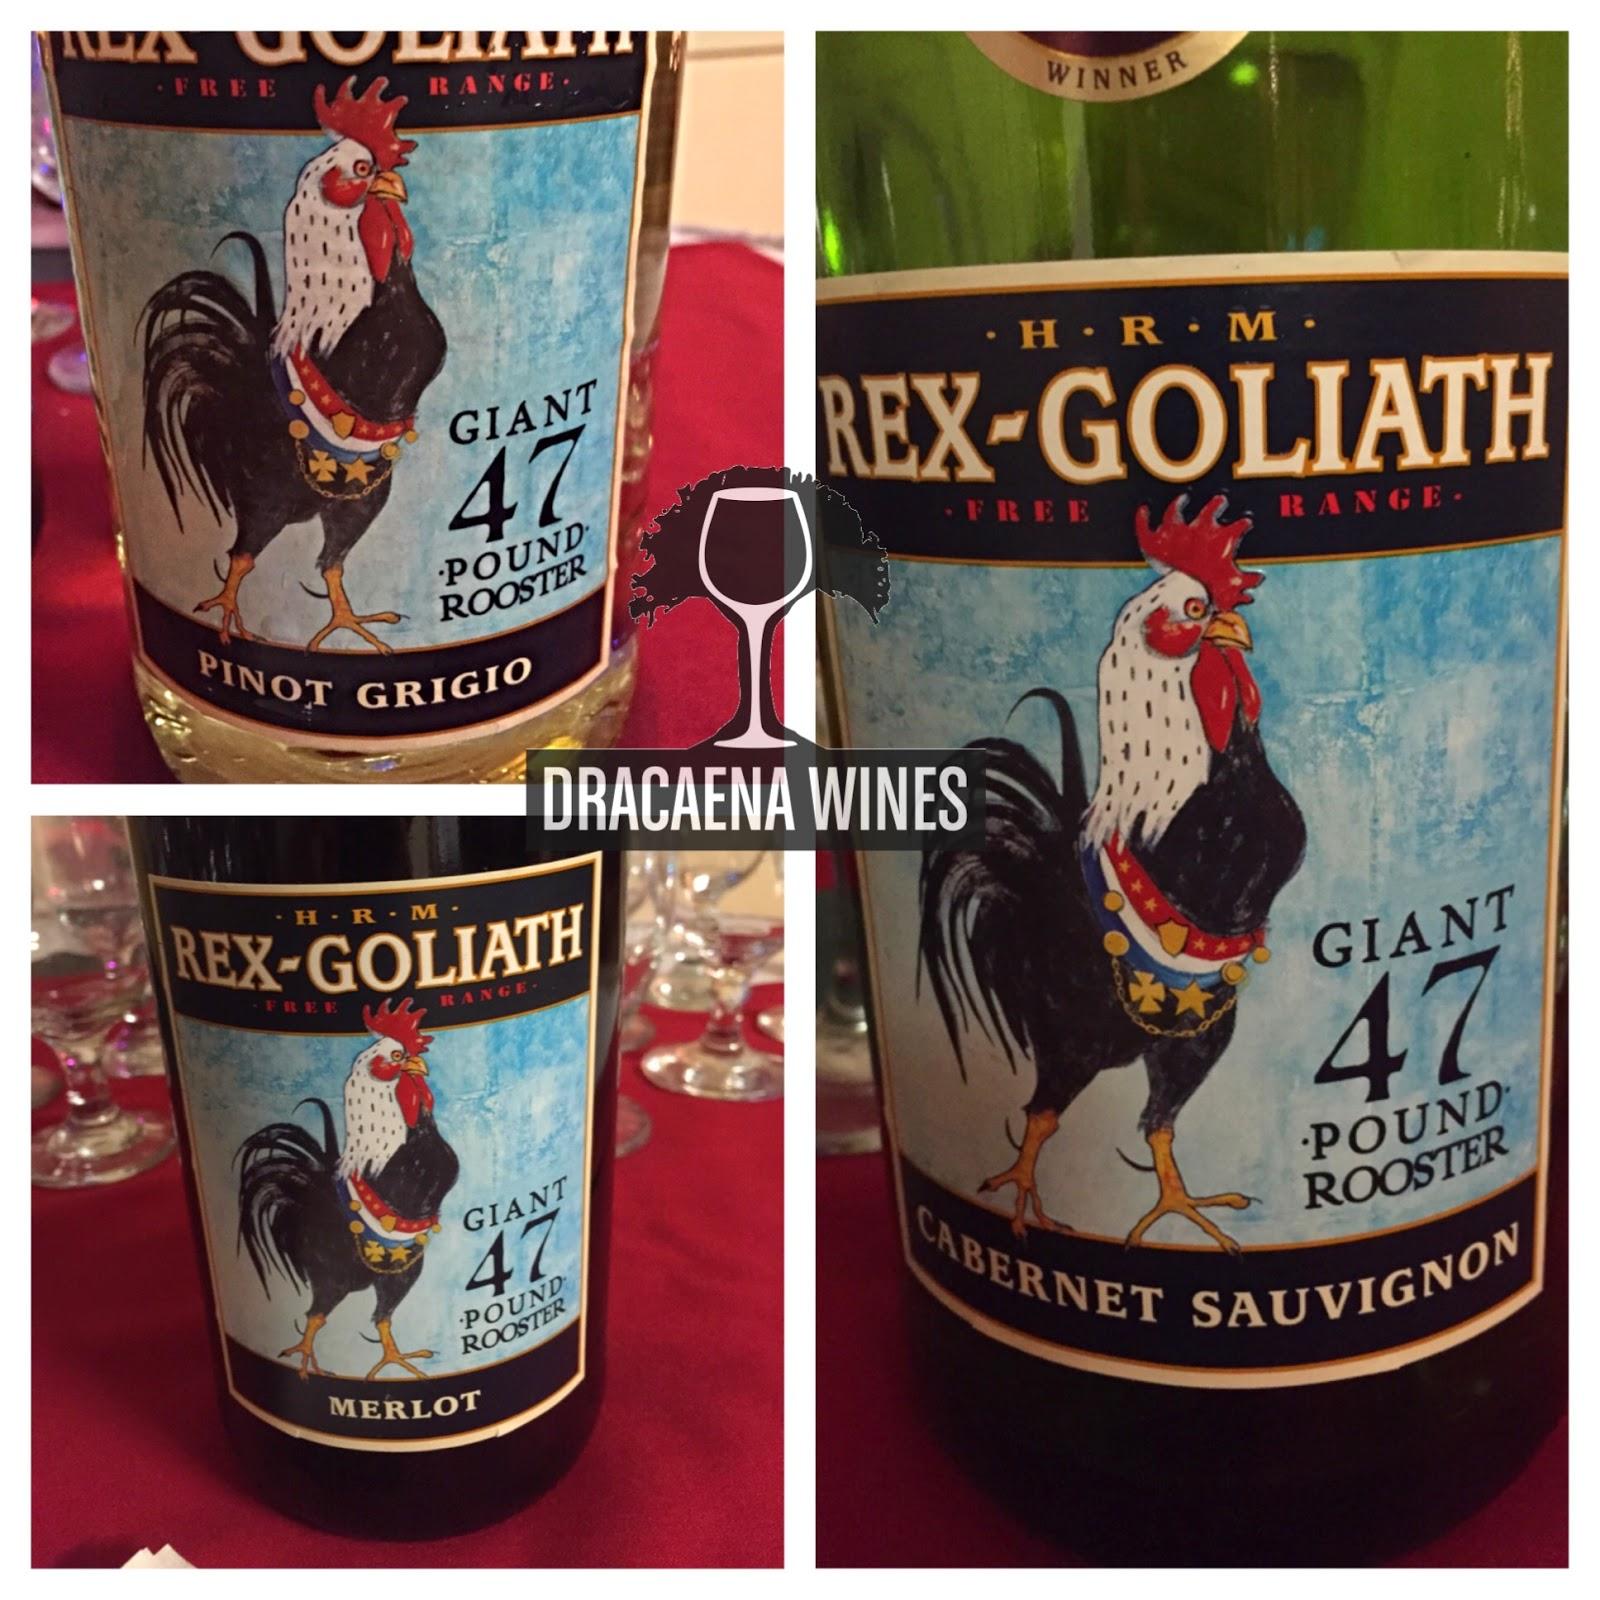 Dracaena wines, holiday wine